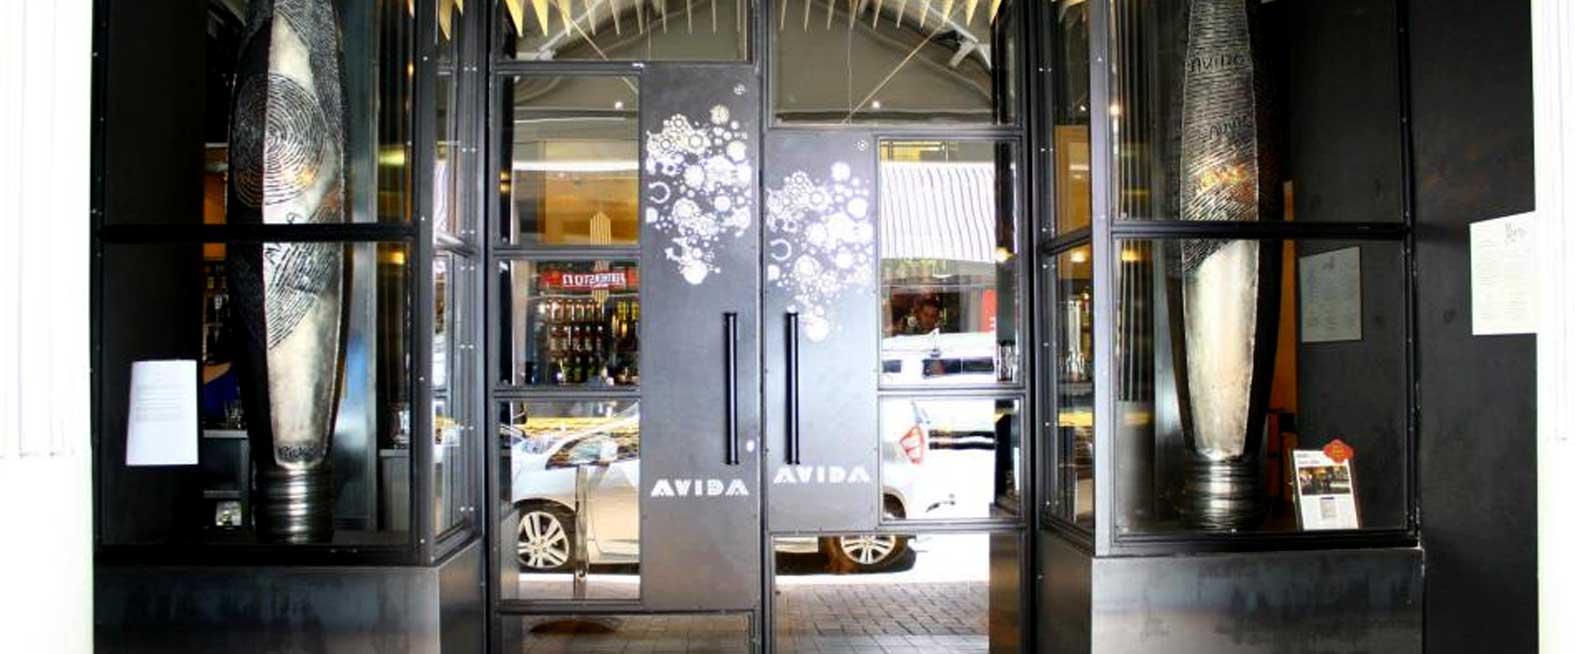 Avida Bar